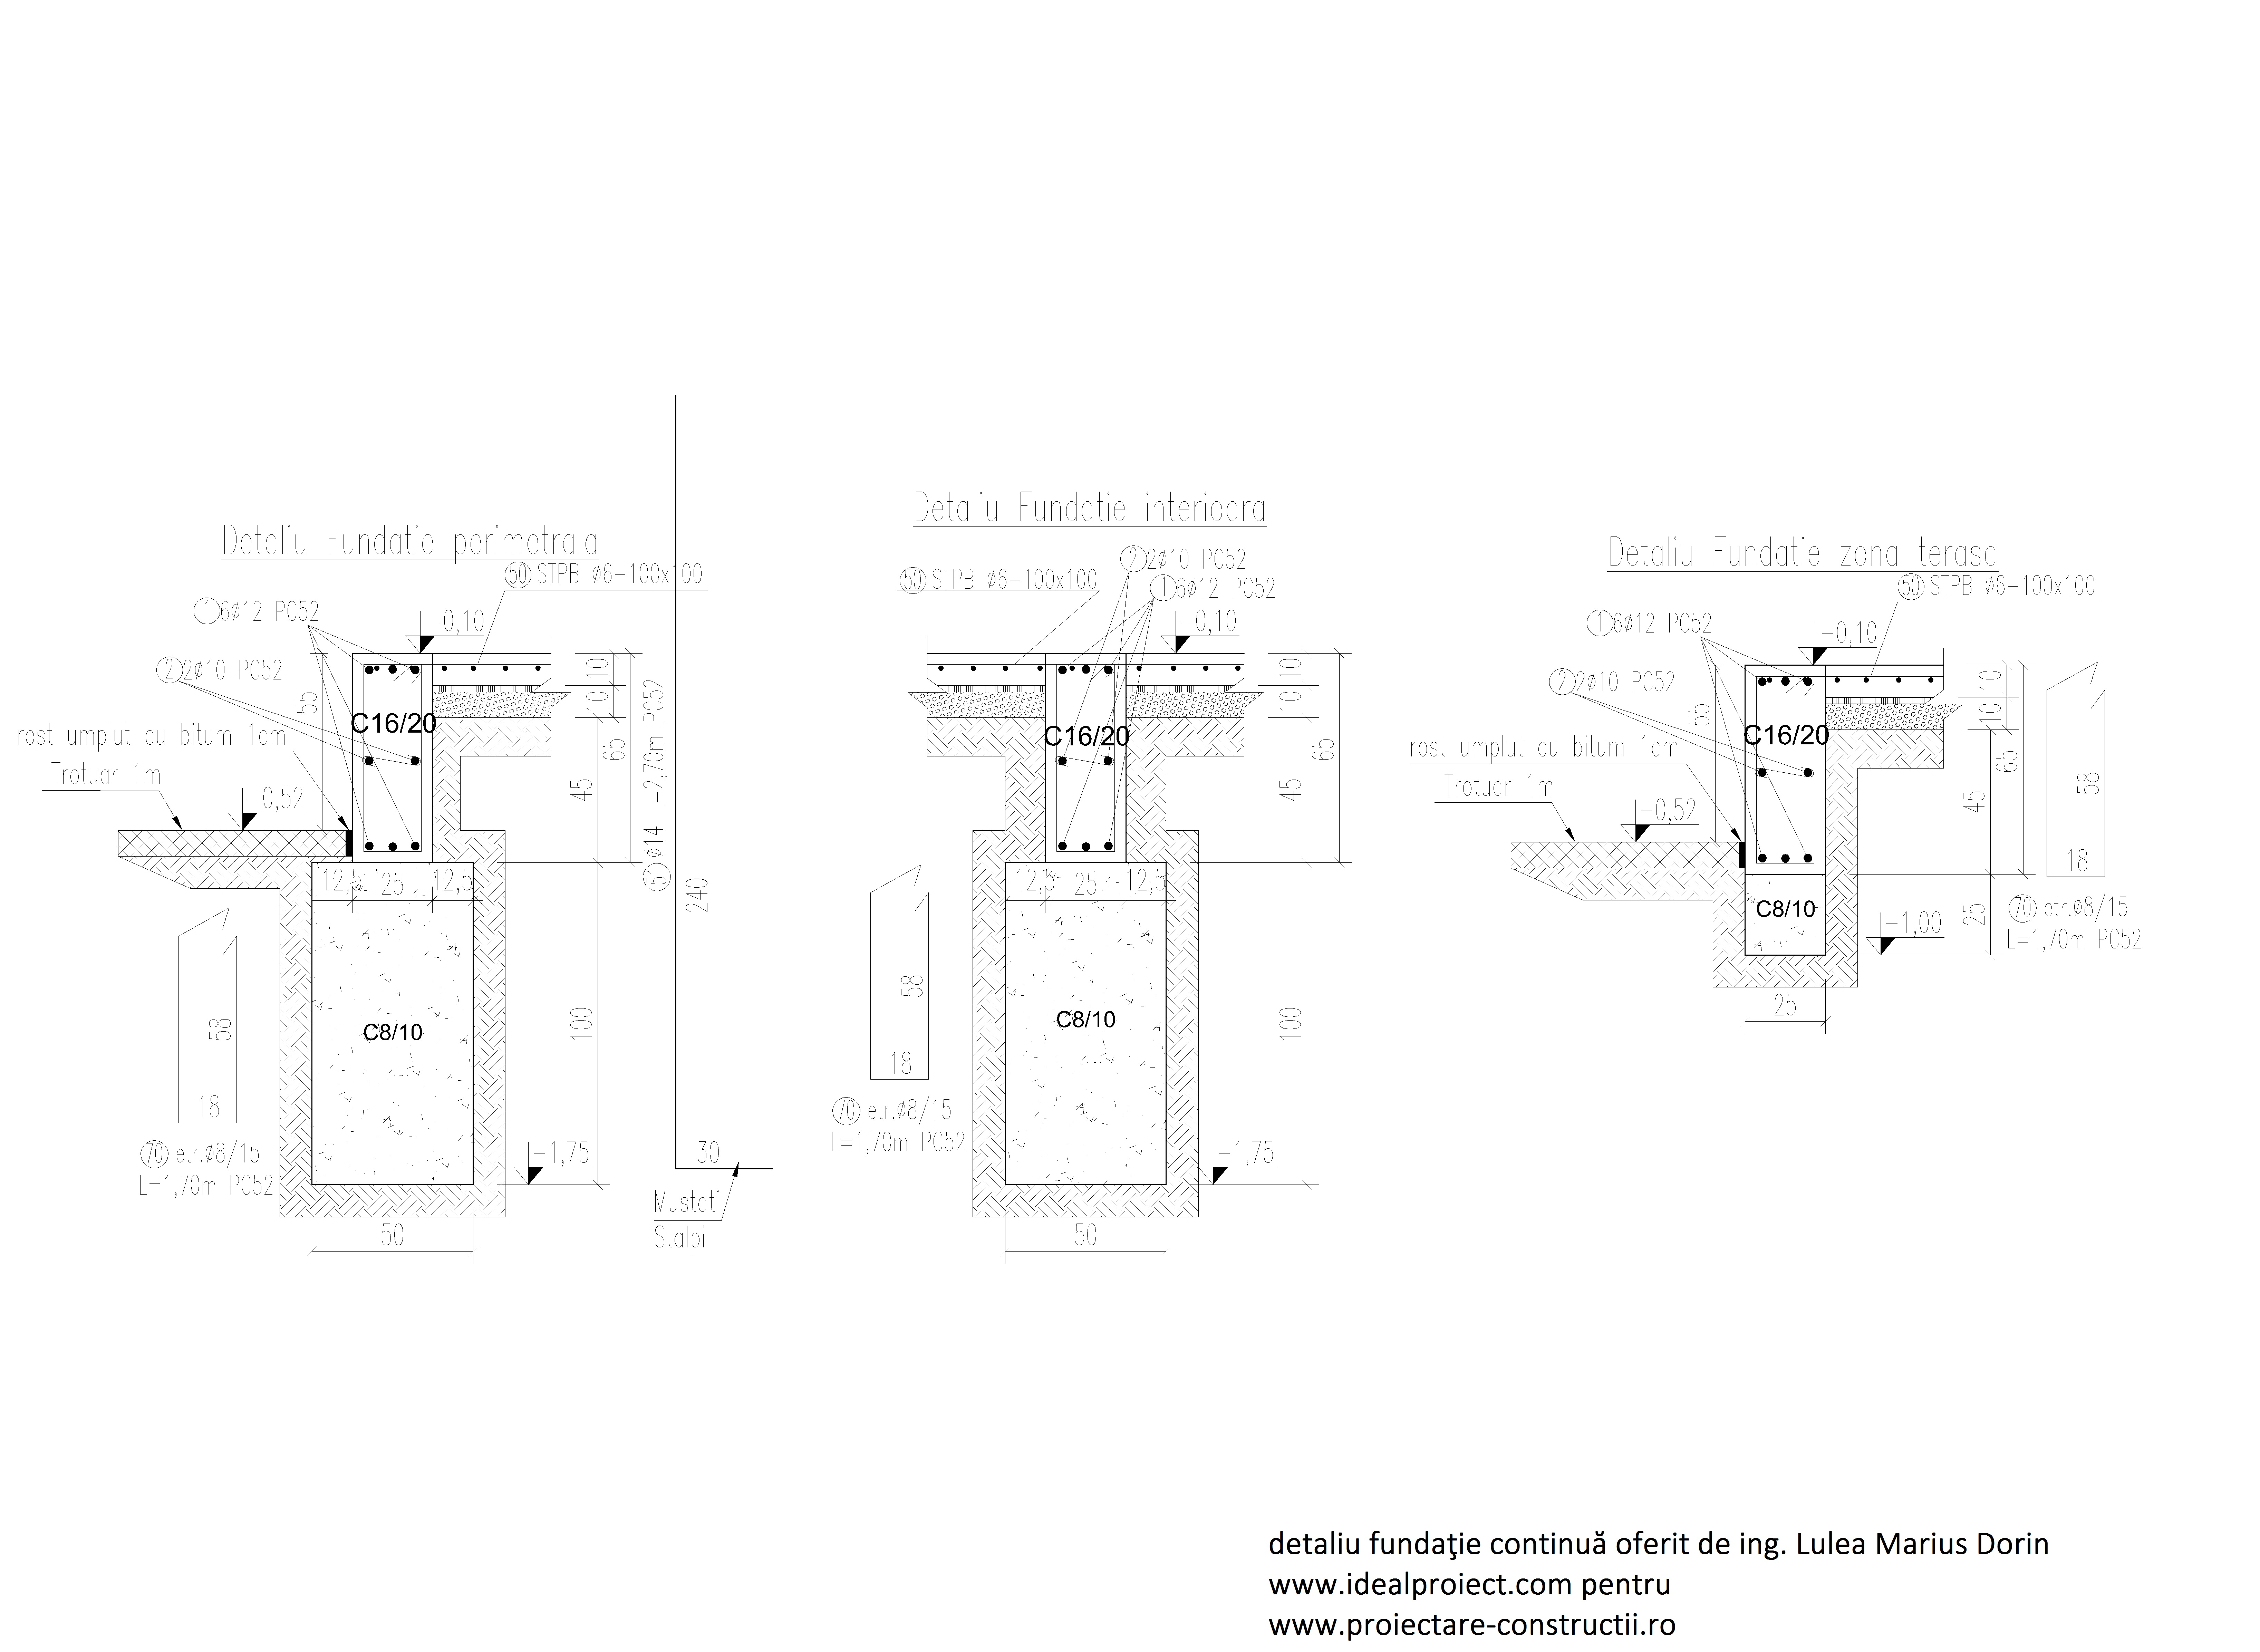 detalii fundatie continua inginer lulea marius dorin ideal proiect